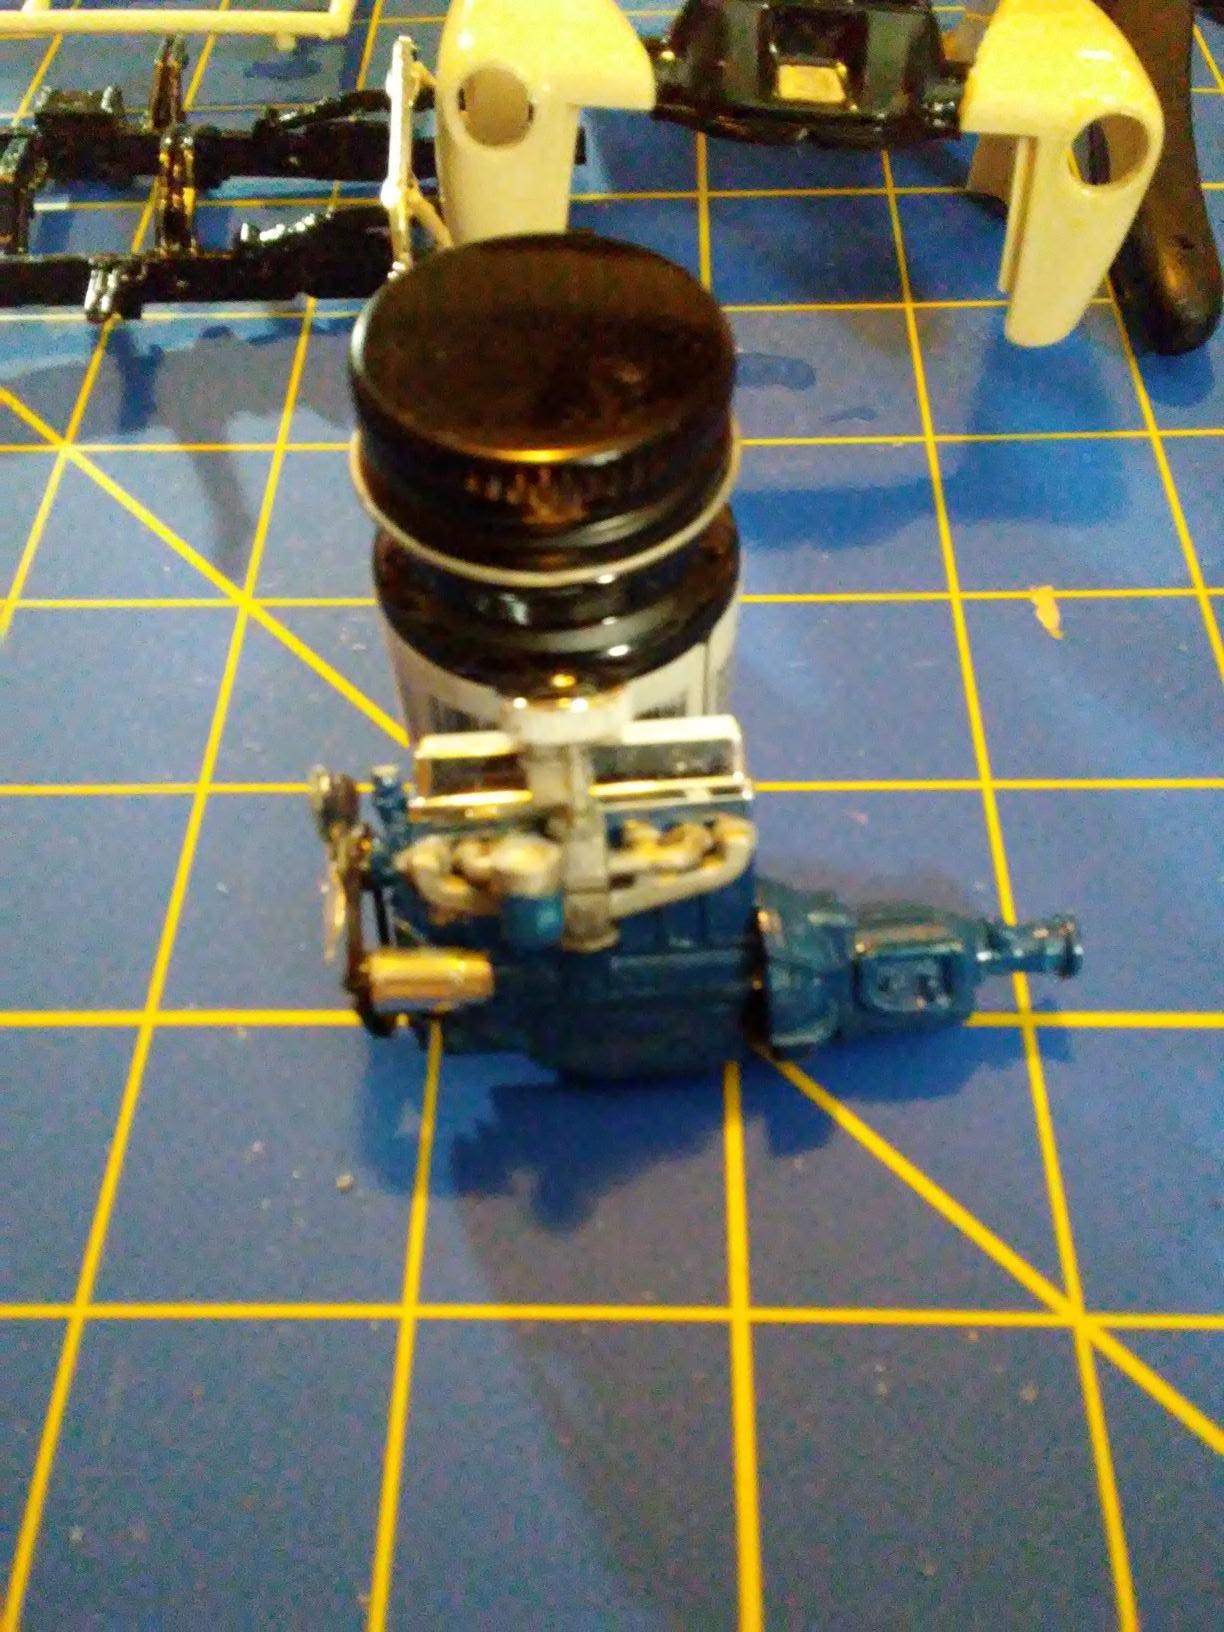 2-50 Chevy Engine 20200517s.jpg